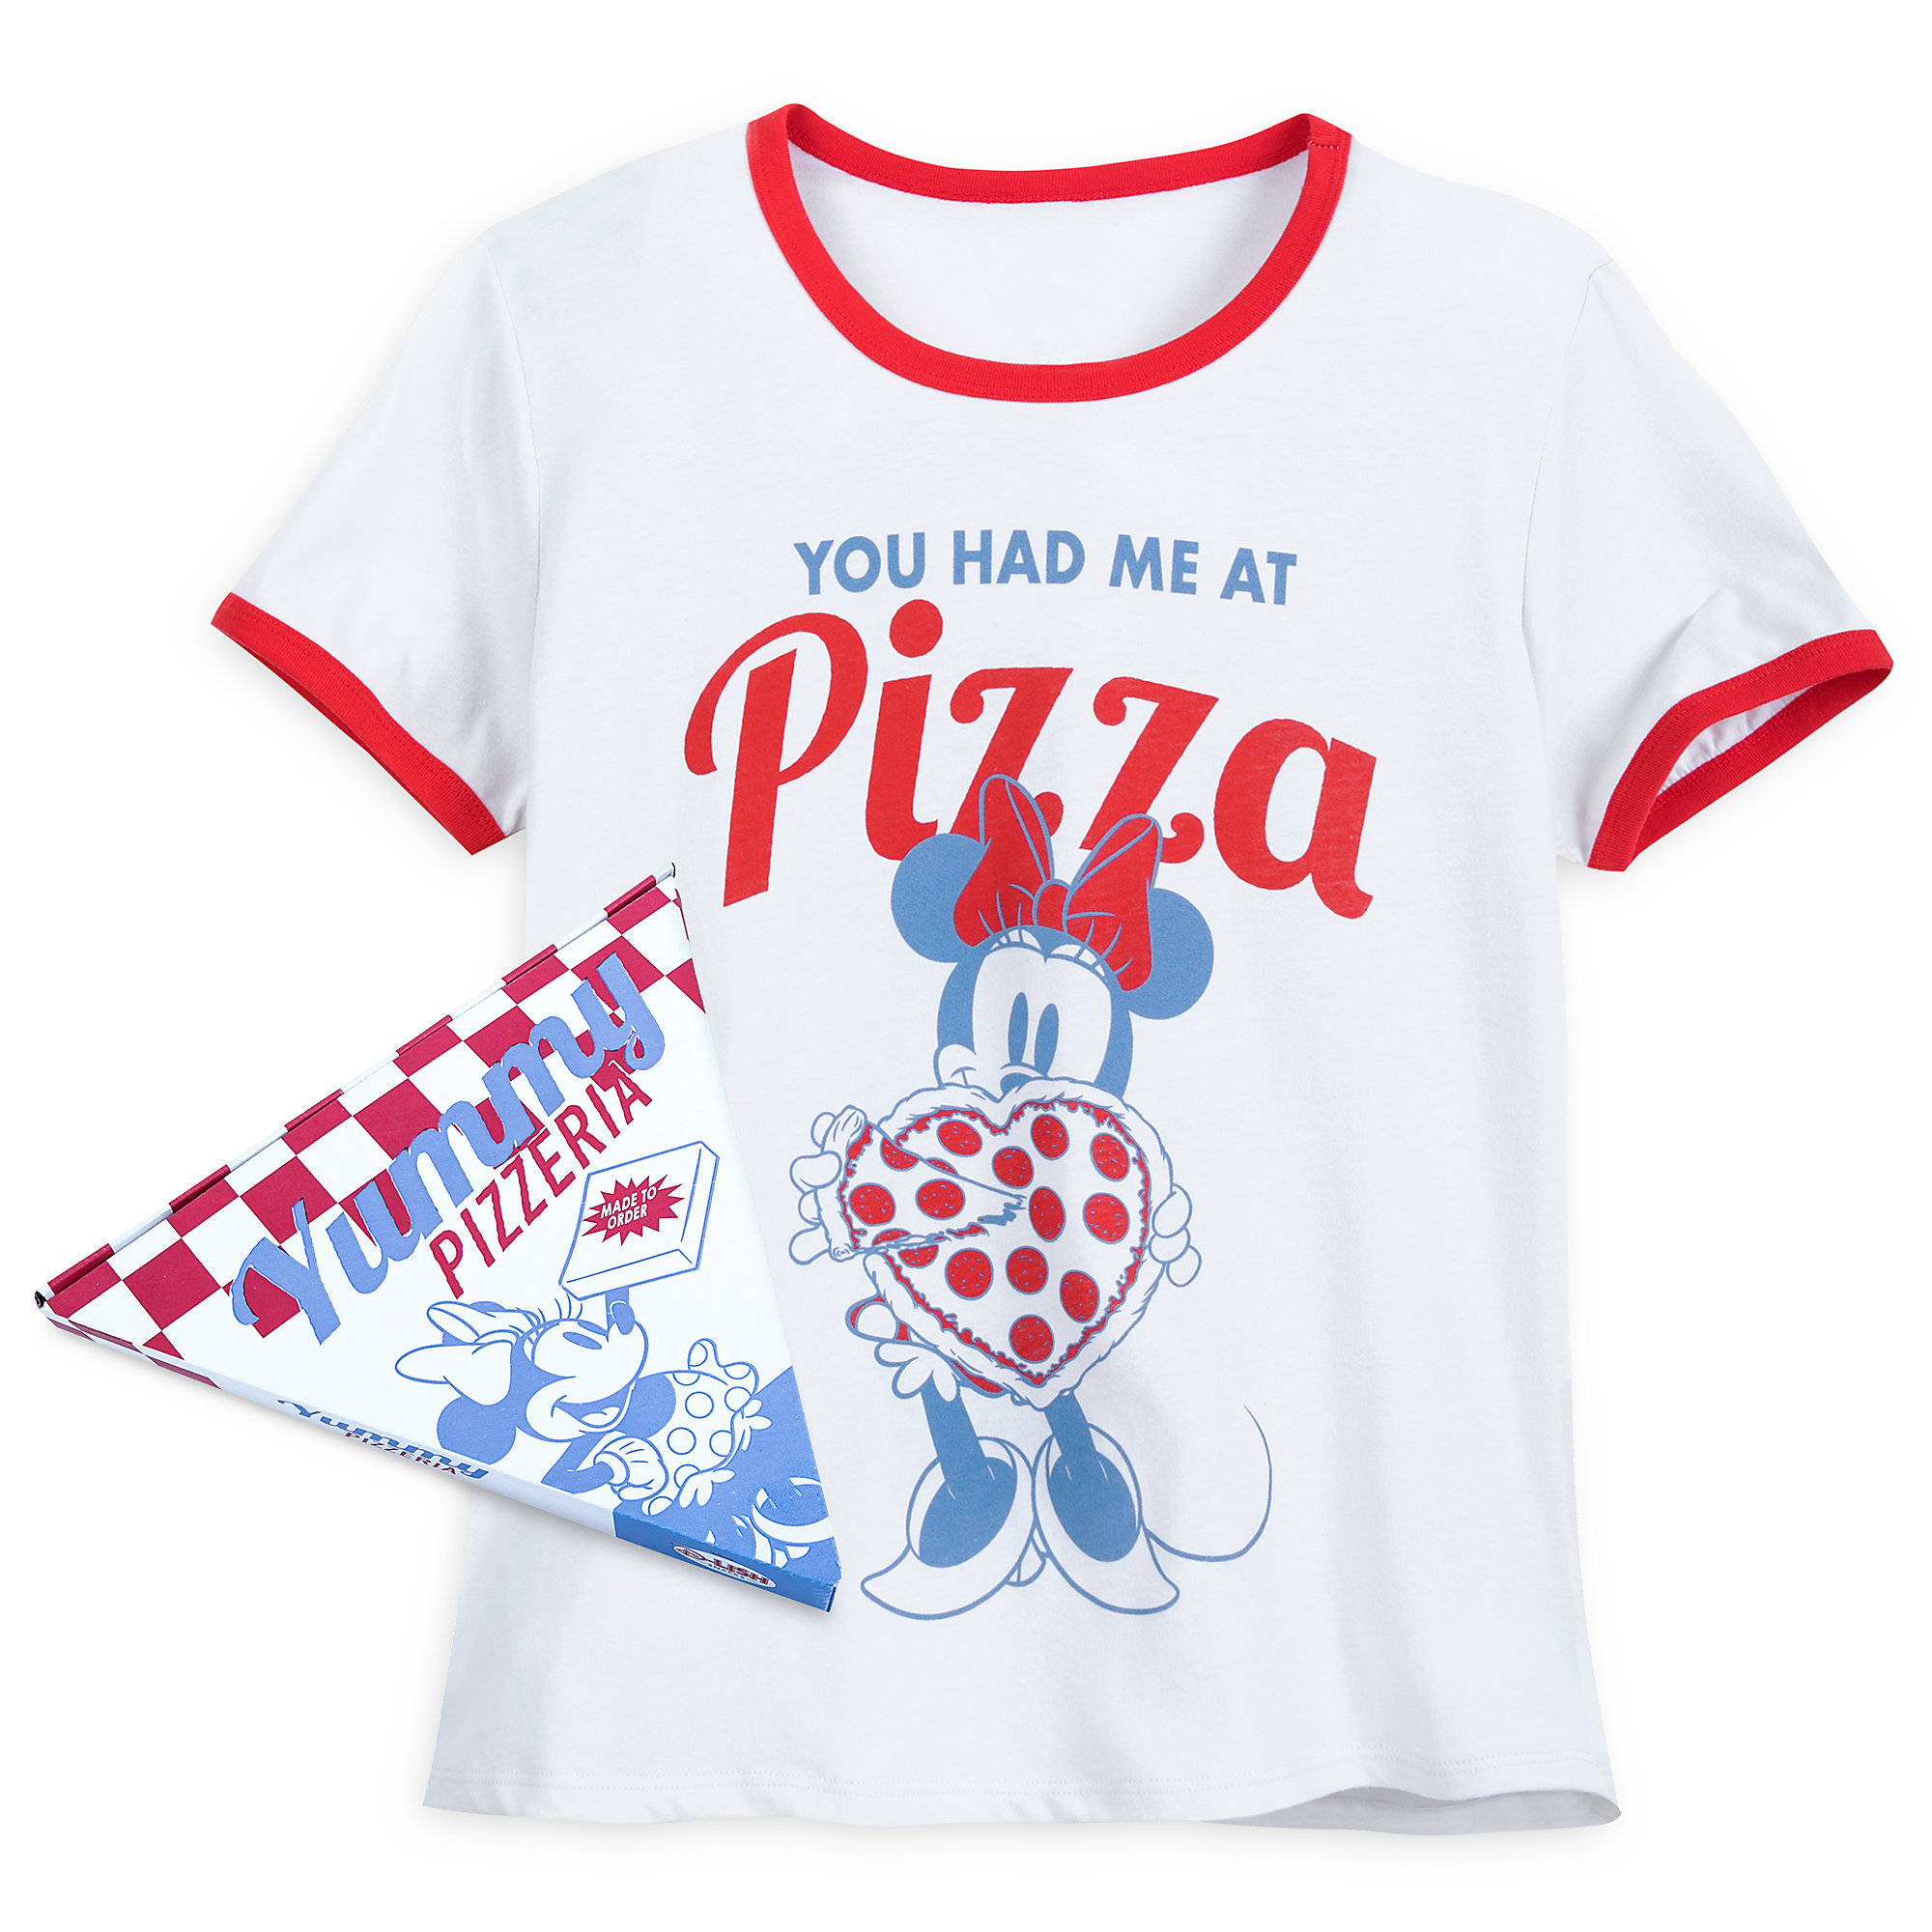 1e062ebd Pizza Is My Crack T-shirt, Womens Ladies Mens Unisex, Pizza T-shirt, Pizza  Graphic Tee, Funny Food T-shirt, Short & Long Sleeve T-shirt .